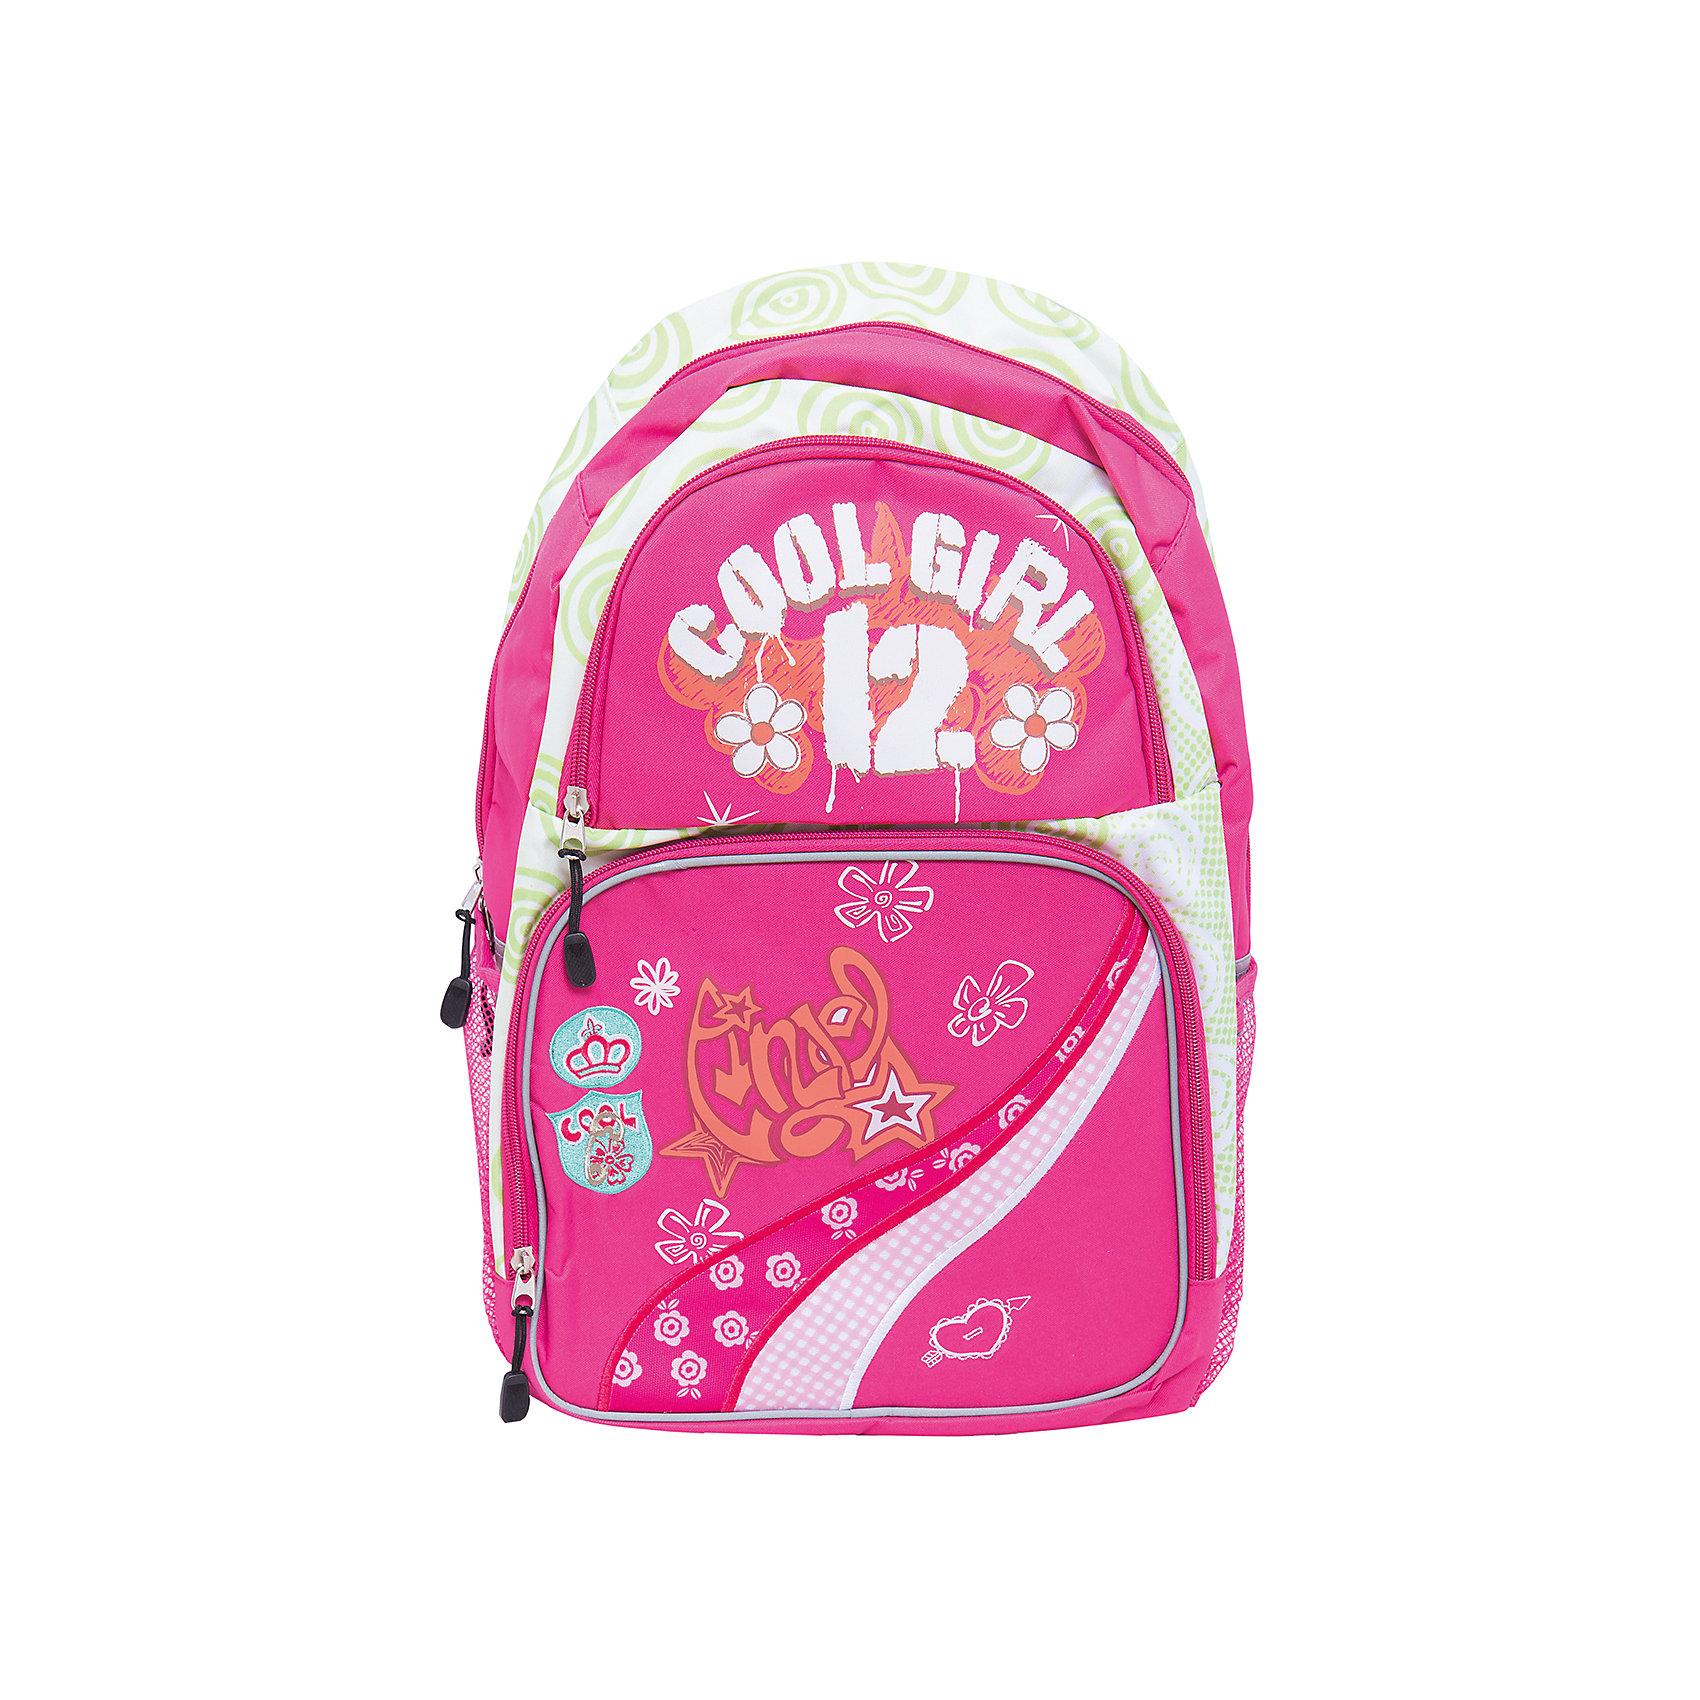 CENTRUM Школьный рюкзак Cool Girl рюкзак girl pu yt00172334